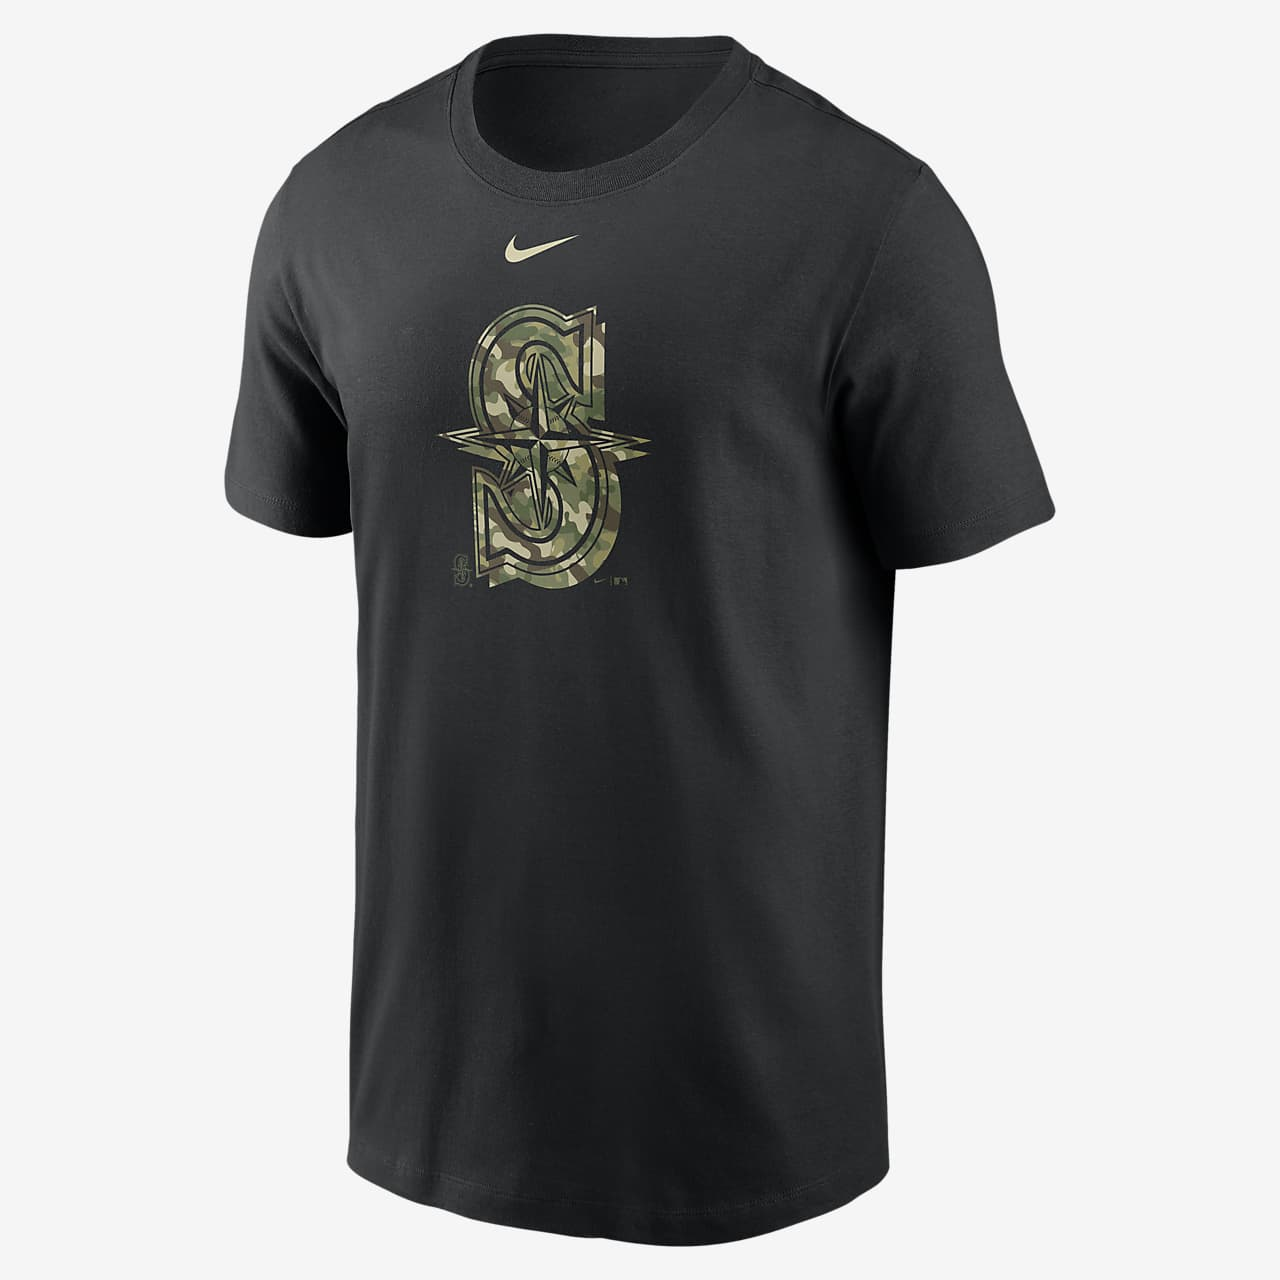 Nike Camo Logo (MLB Seattle Mariners) Men's T-Shirt